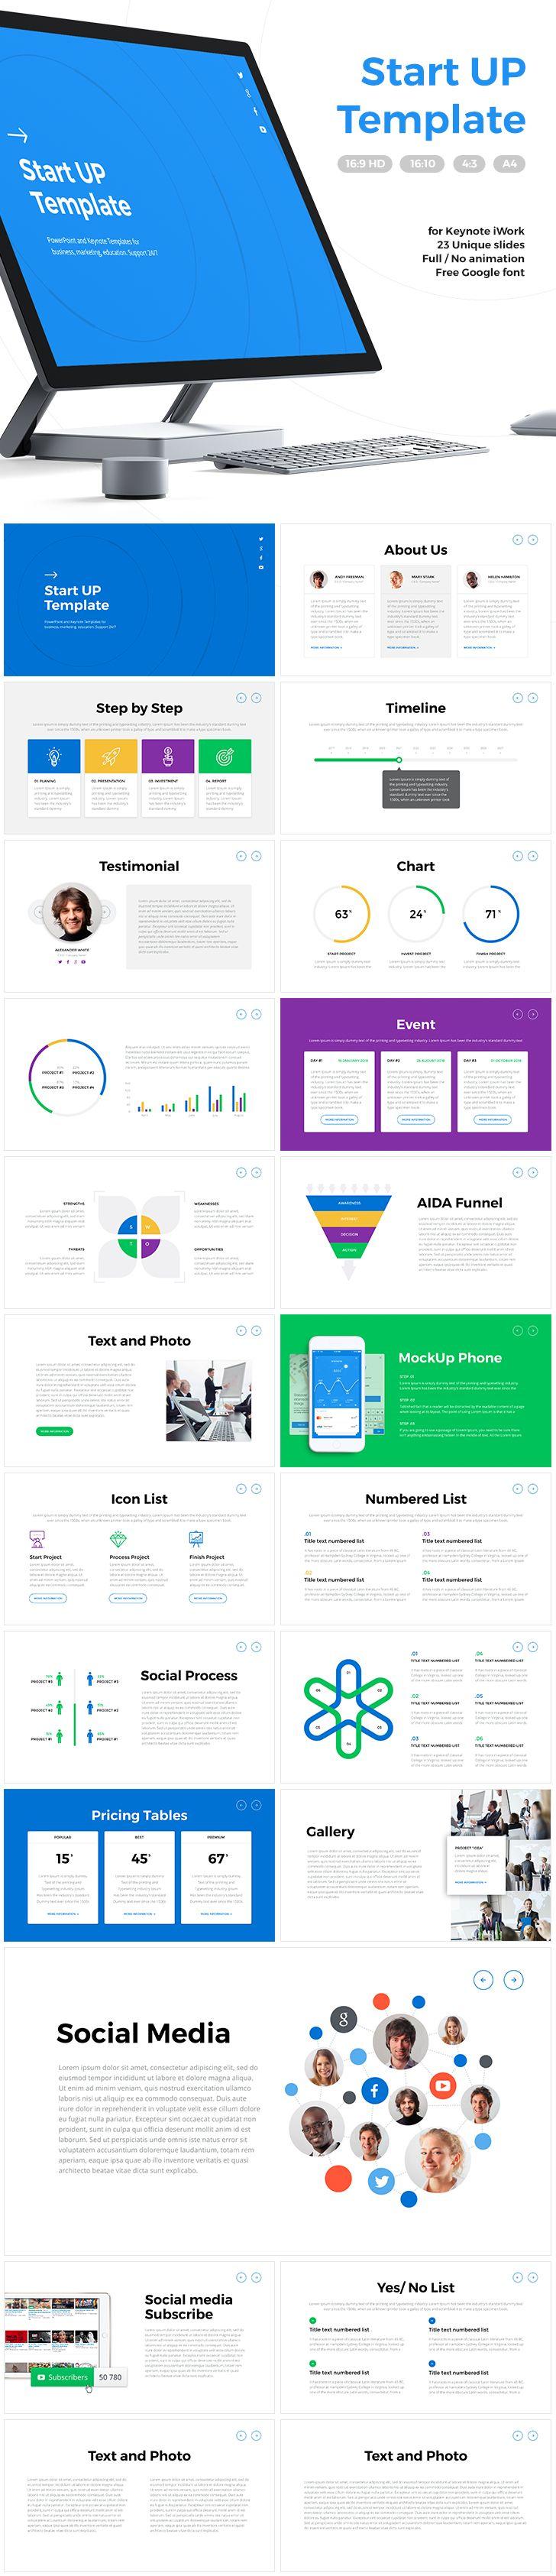 "Download Link: https://goo.gl/PjfLvJ ""StartUp"": 23 Unique slides, Full / No animation, timeline, chart, about us slide, iphone mockup, ipad mockup, AIDA Funnel, SWOT analysis. Aspect Ratio - 16:9, 16:10, 4:3. A4. Material Design. For iWork Keynote"